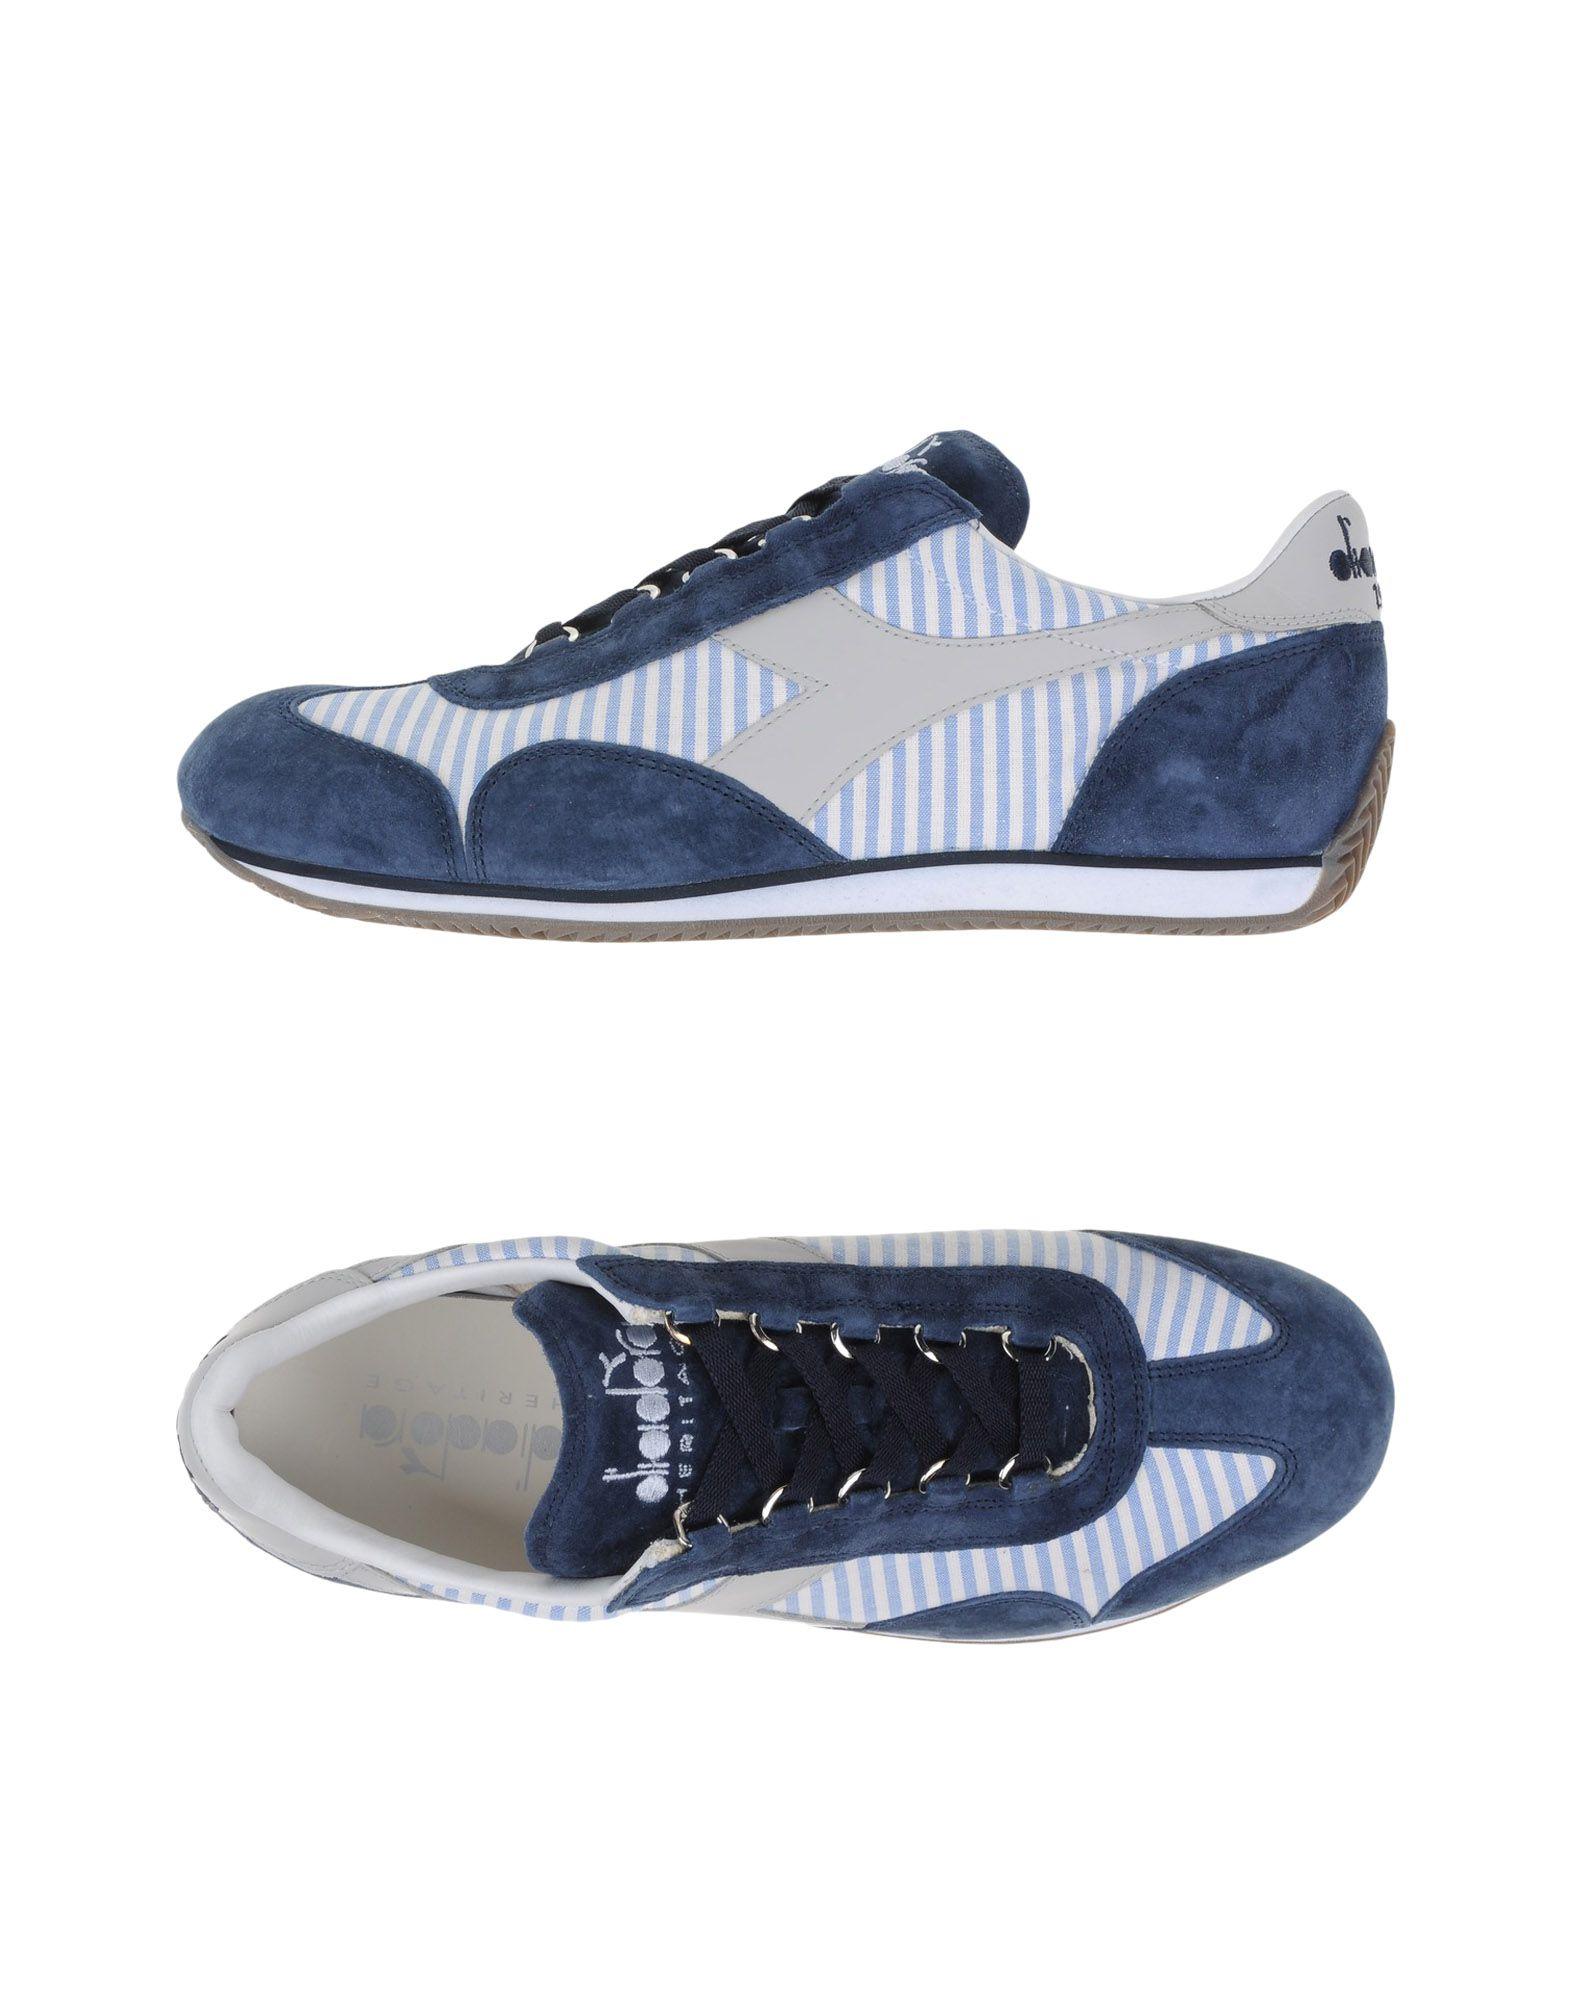 Sneakers Diadora Heritage Equipe Stripe - Uomo - Acquista online su